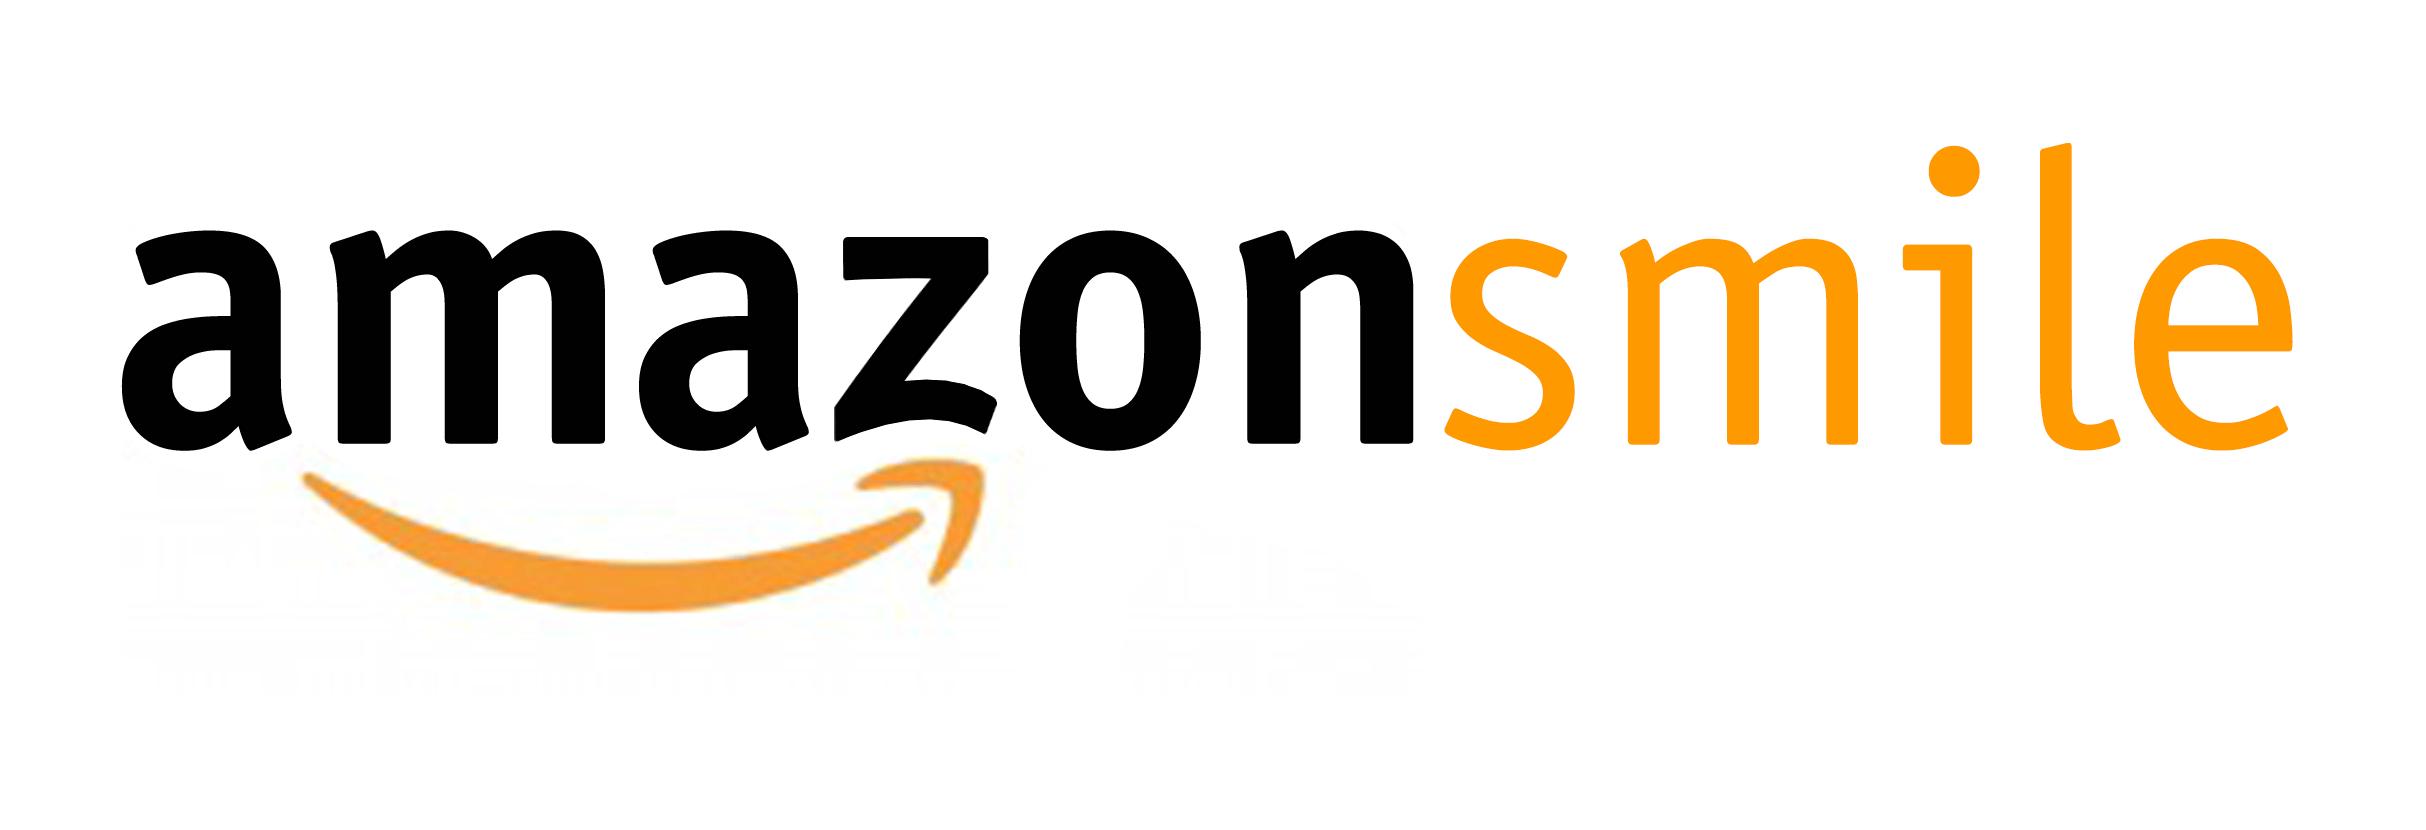 Amazon Smile logo.png